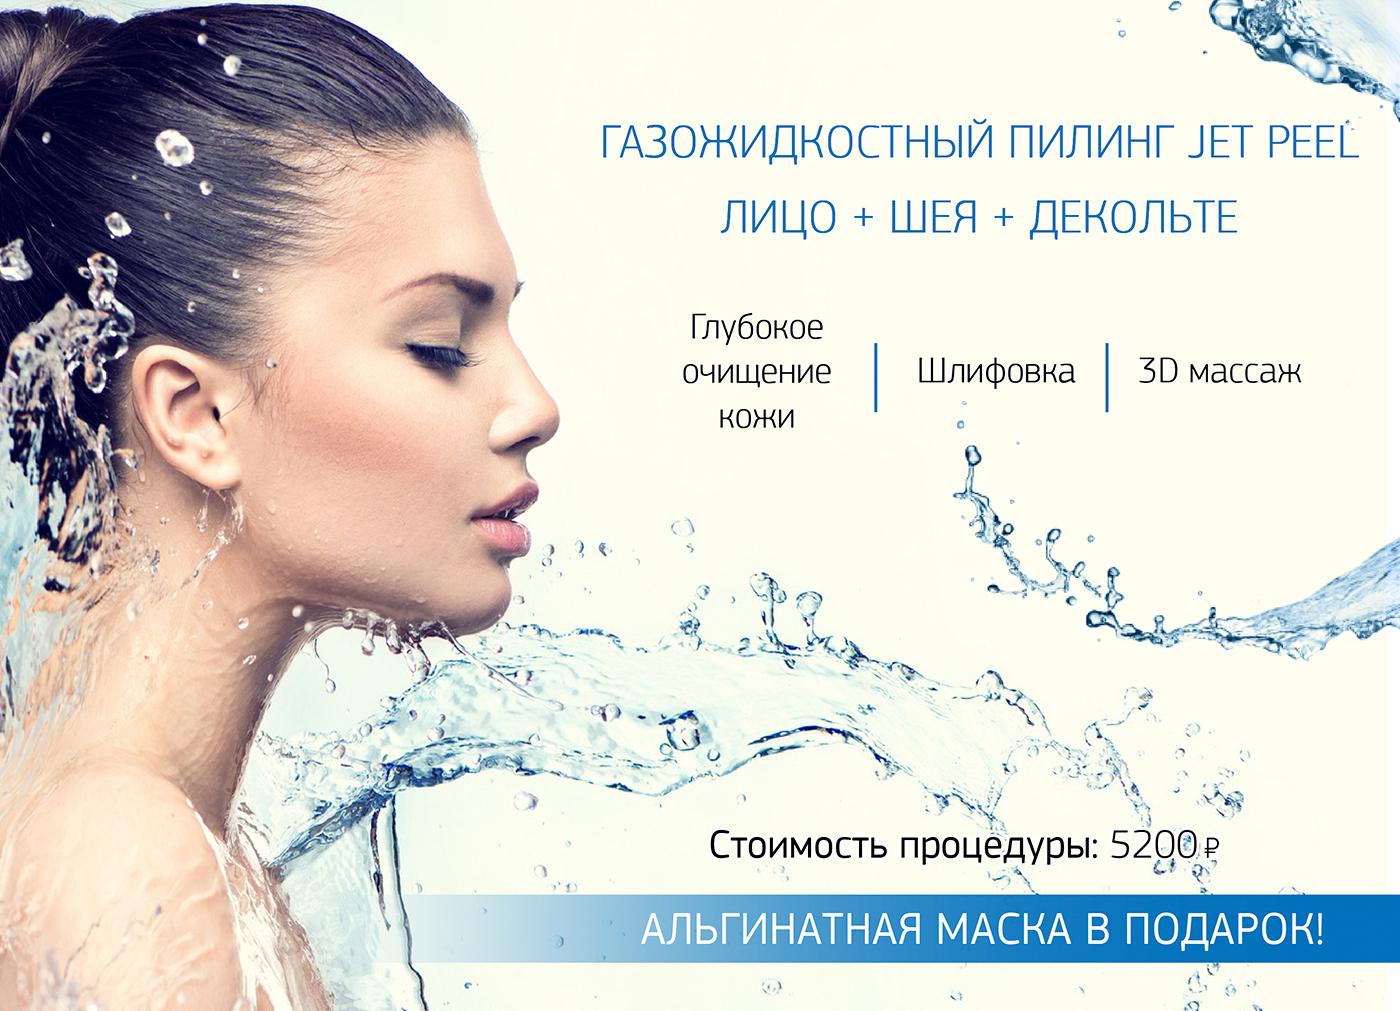 jet_peel_aksiya_banner